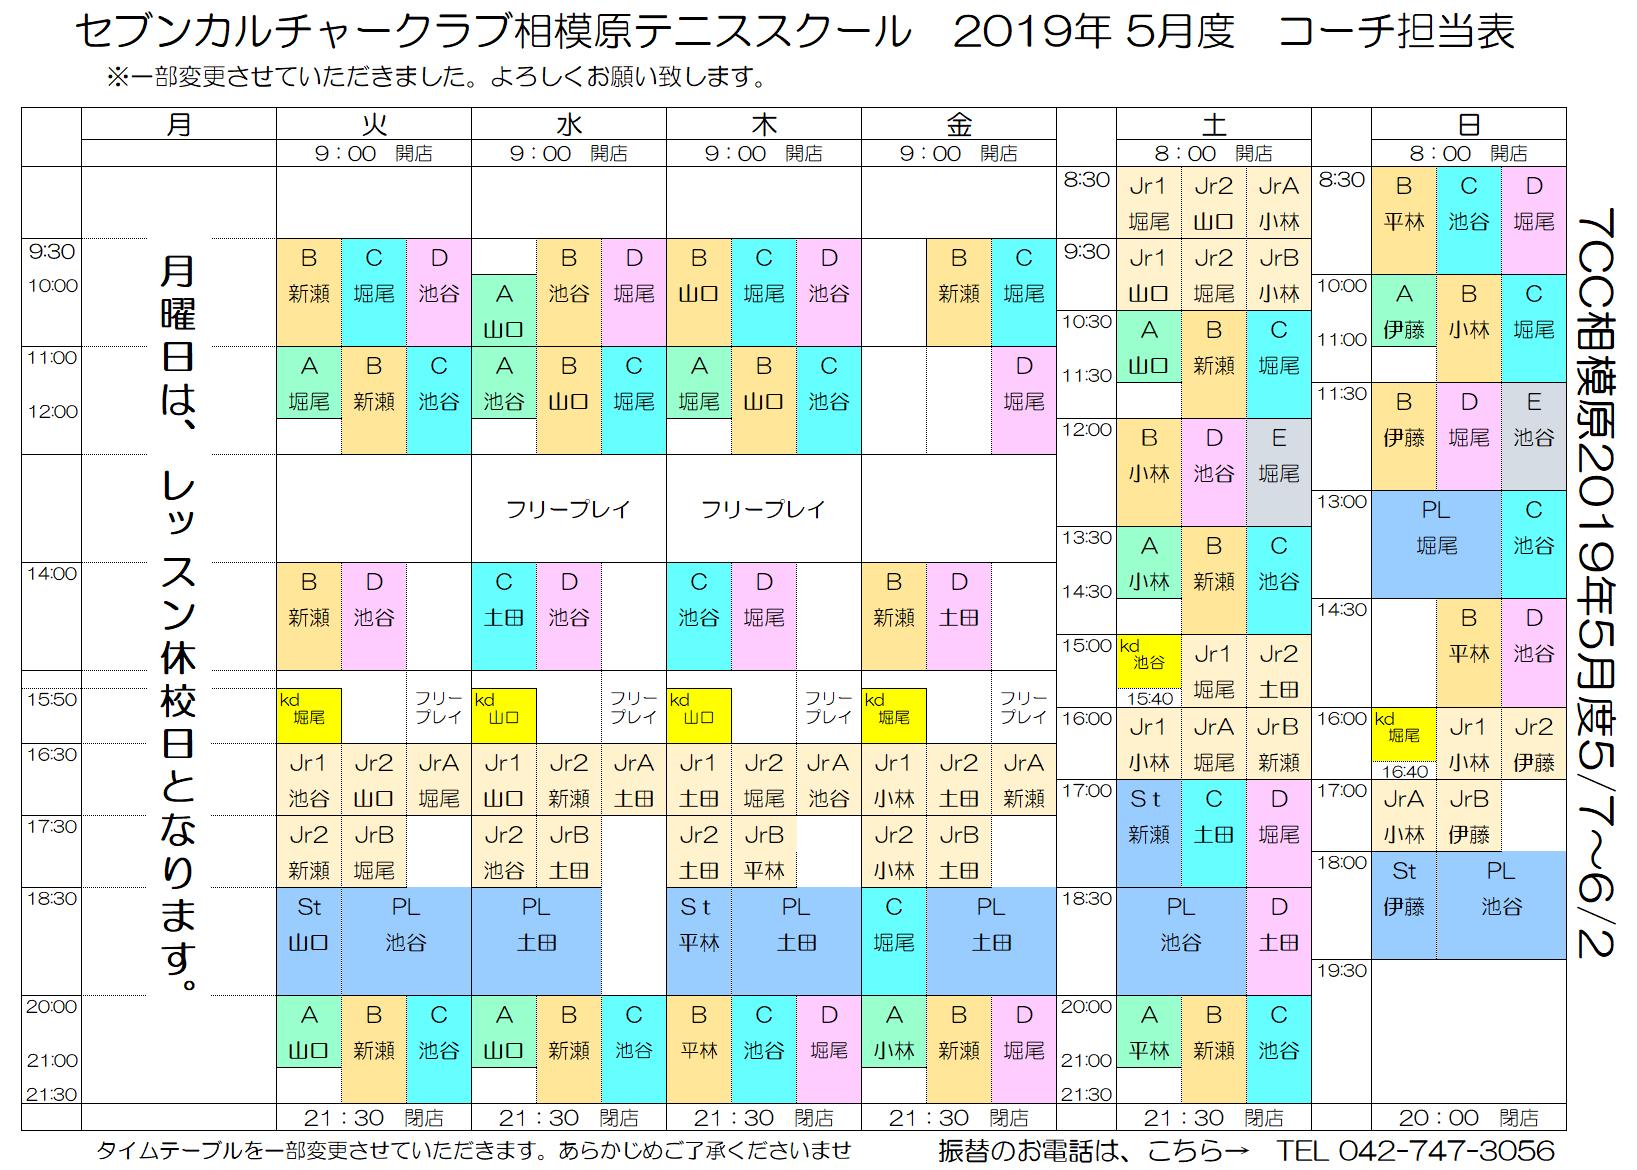 201905HPコーチ担当表